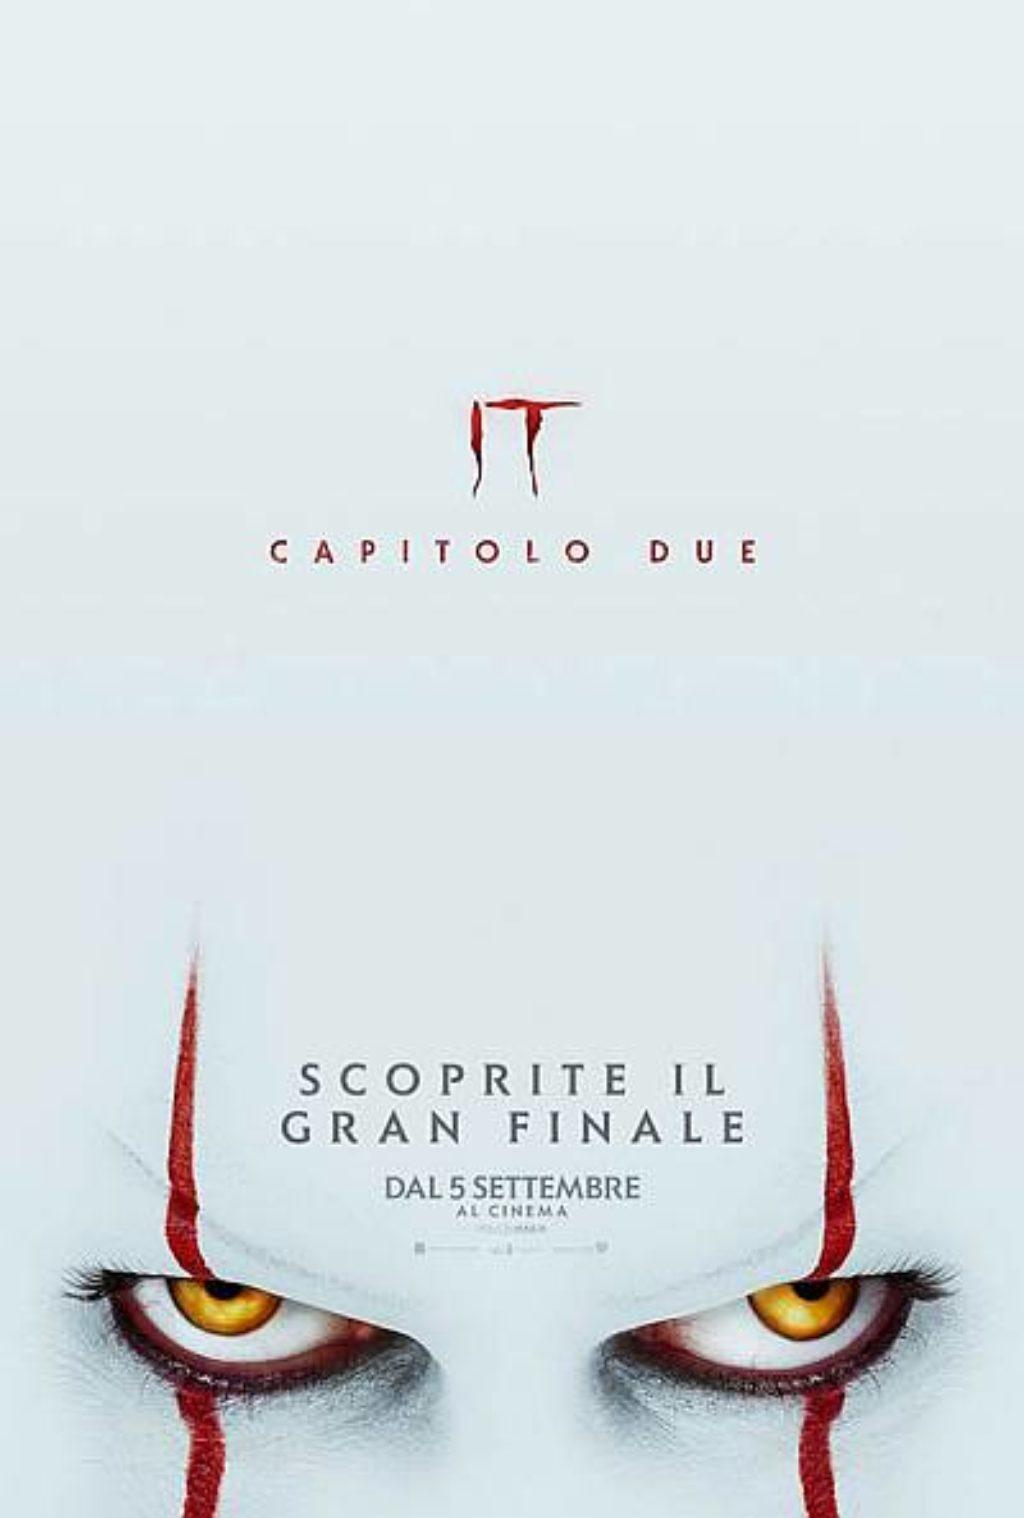 itcapitolo2_big